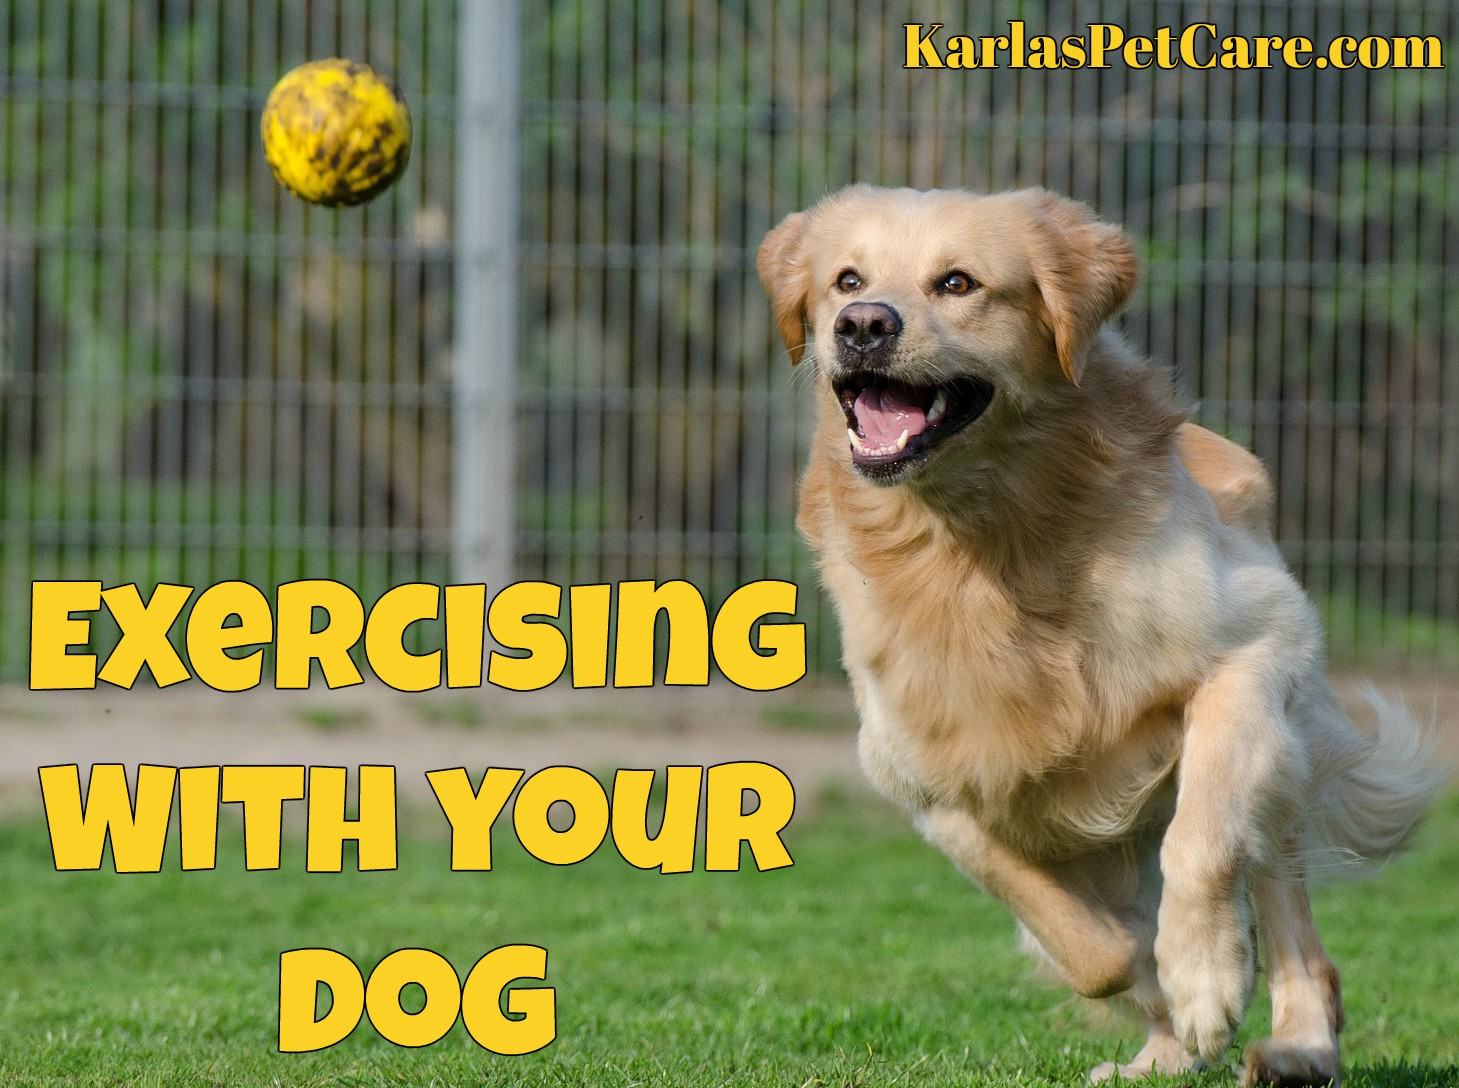 karla - exercise dog pic